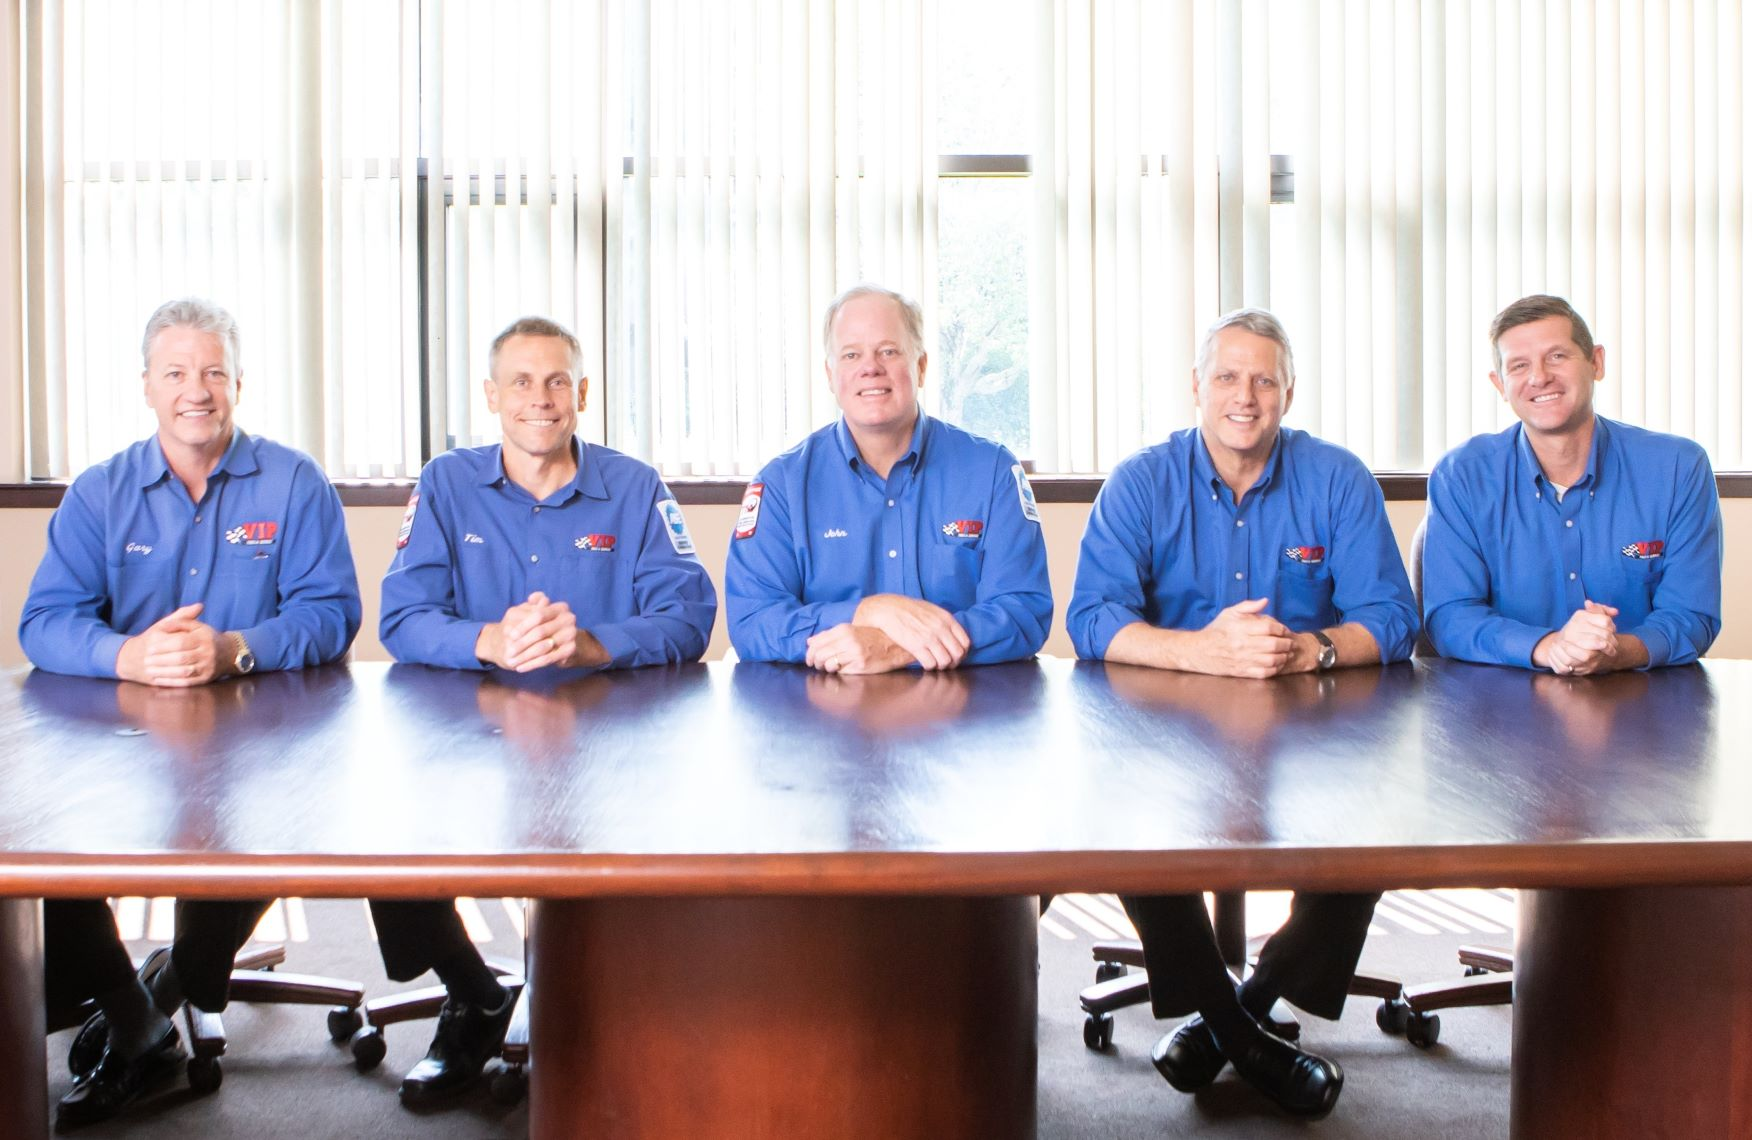 VIP Tires & Service Names Tim Winkeler Next CEO